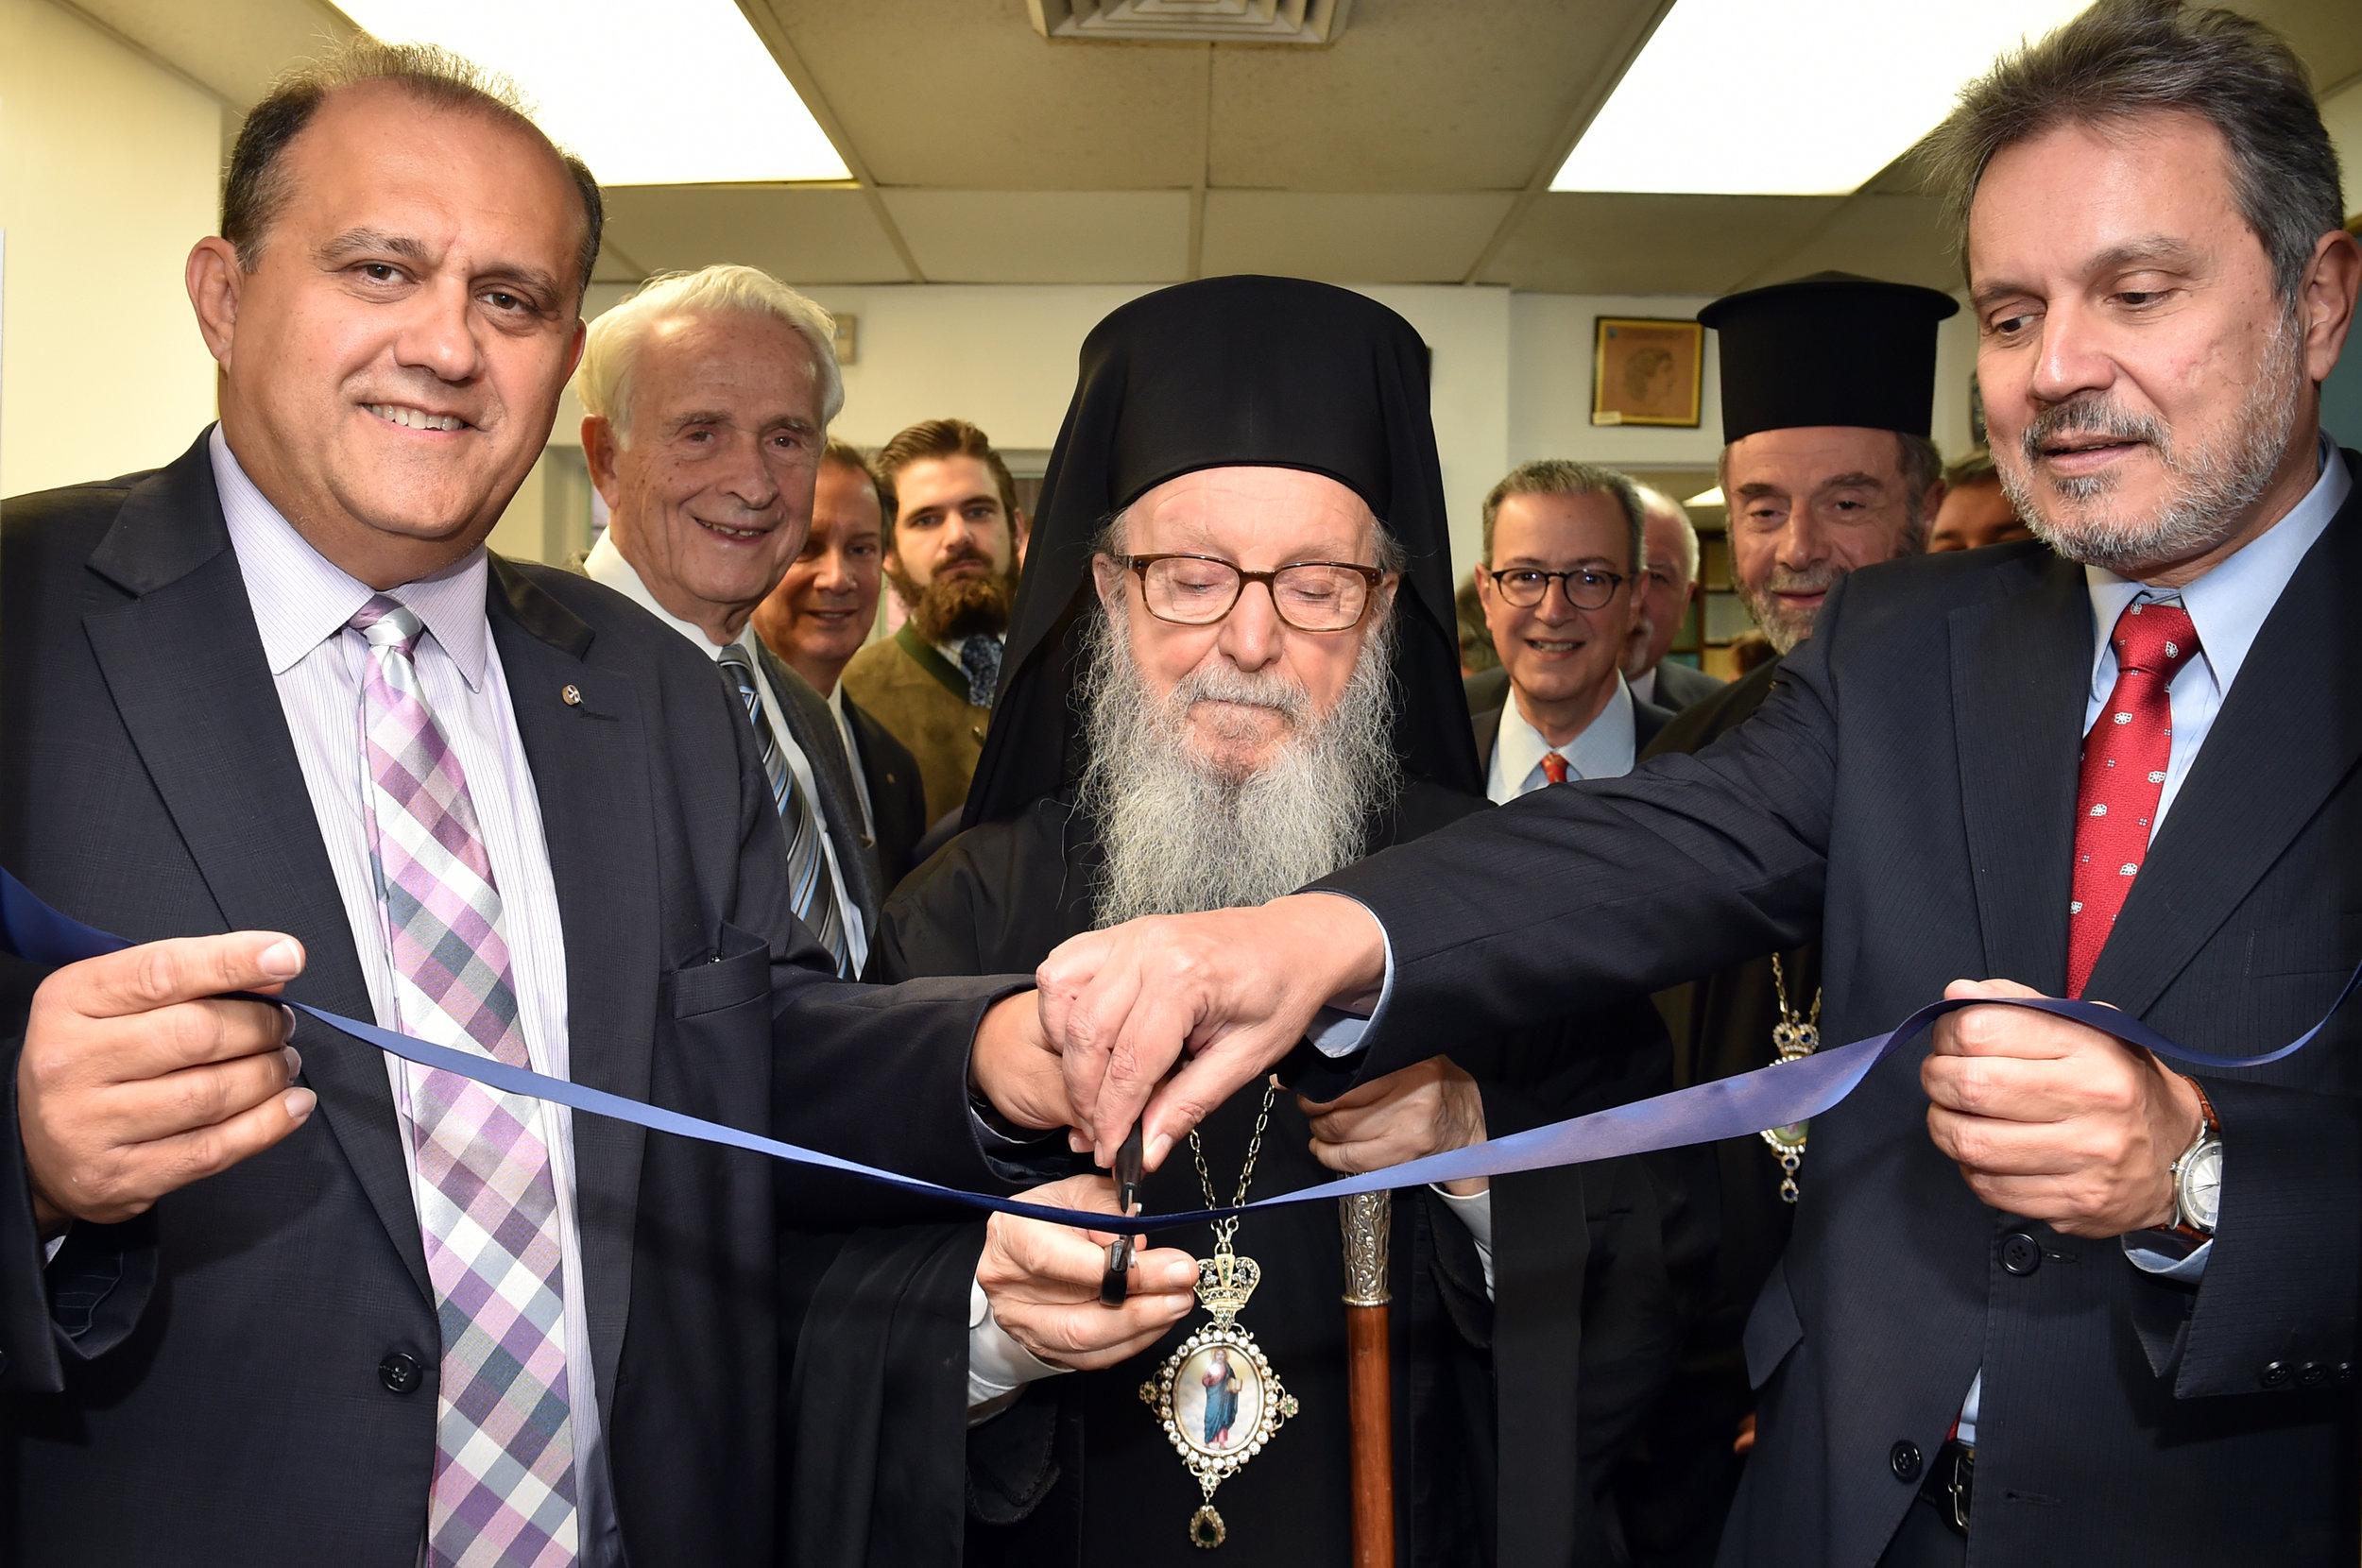 His Eminence, Nick Larigakis, and Ambassador Haris Lalacos of Greece cut the ceremonial ribbon.